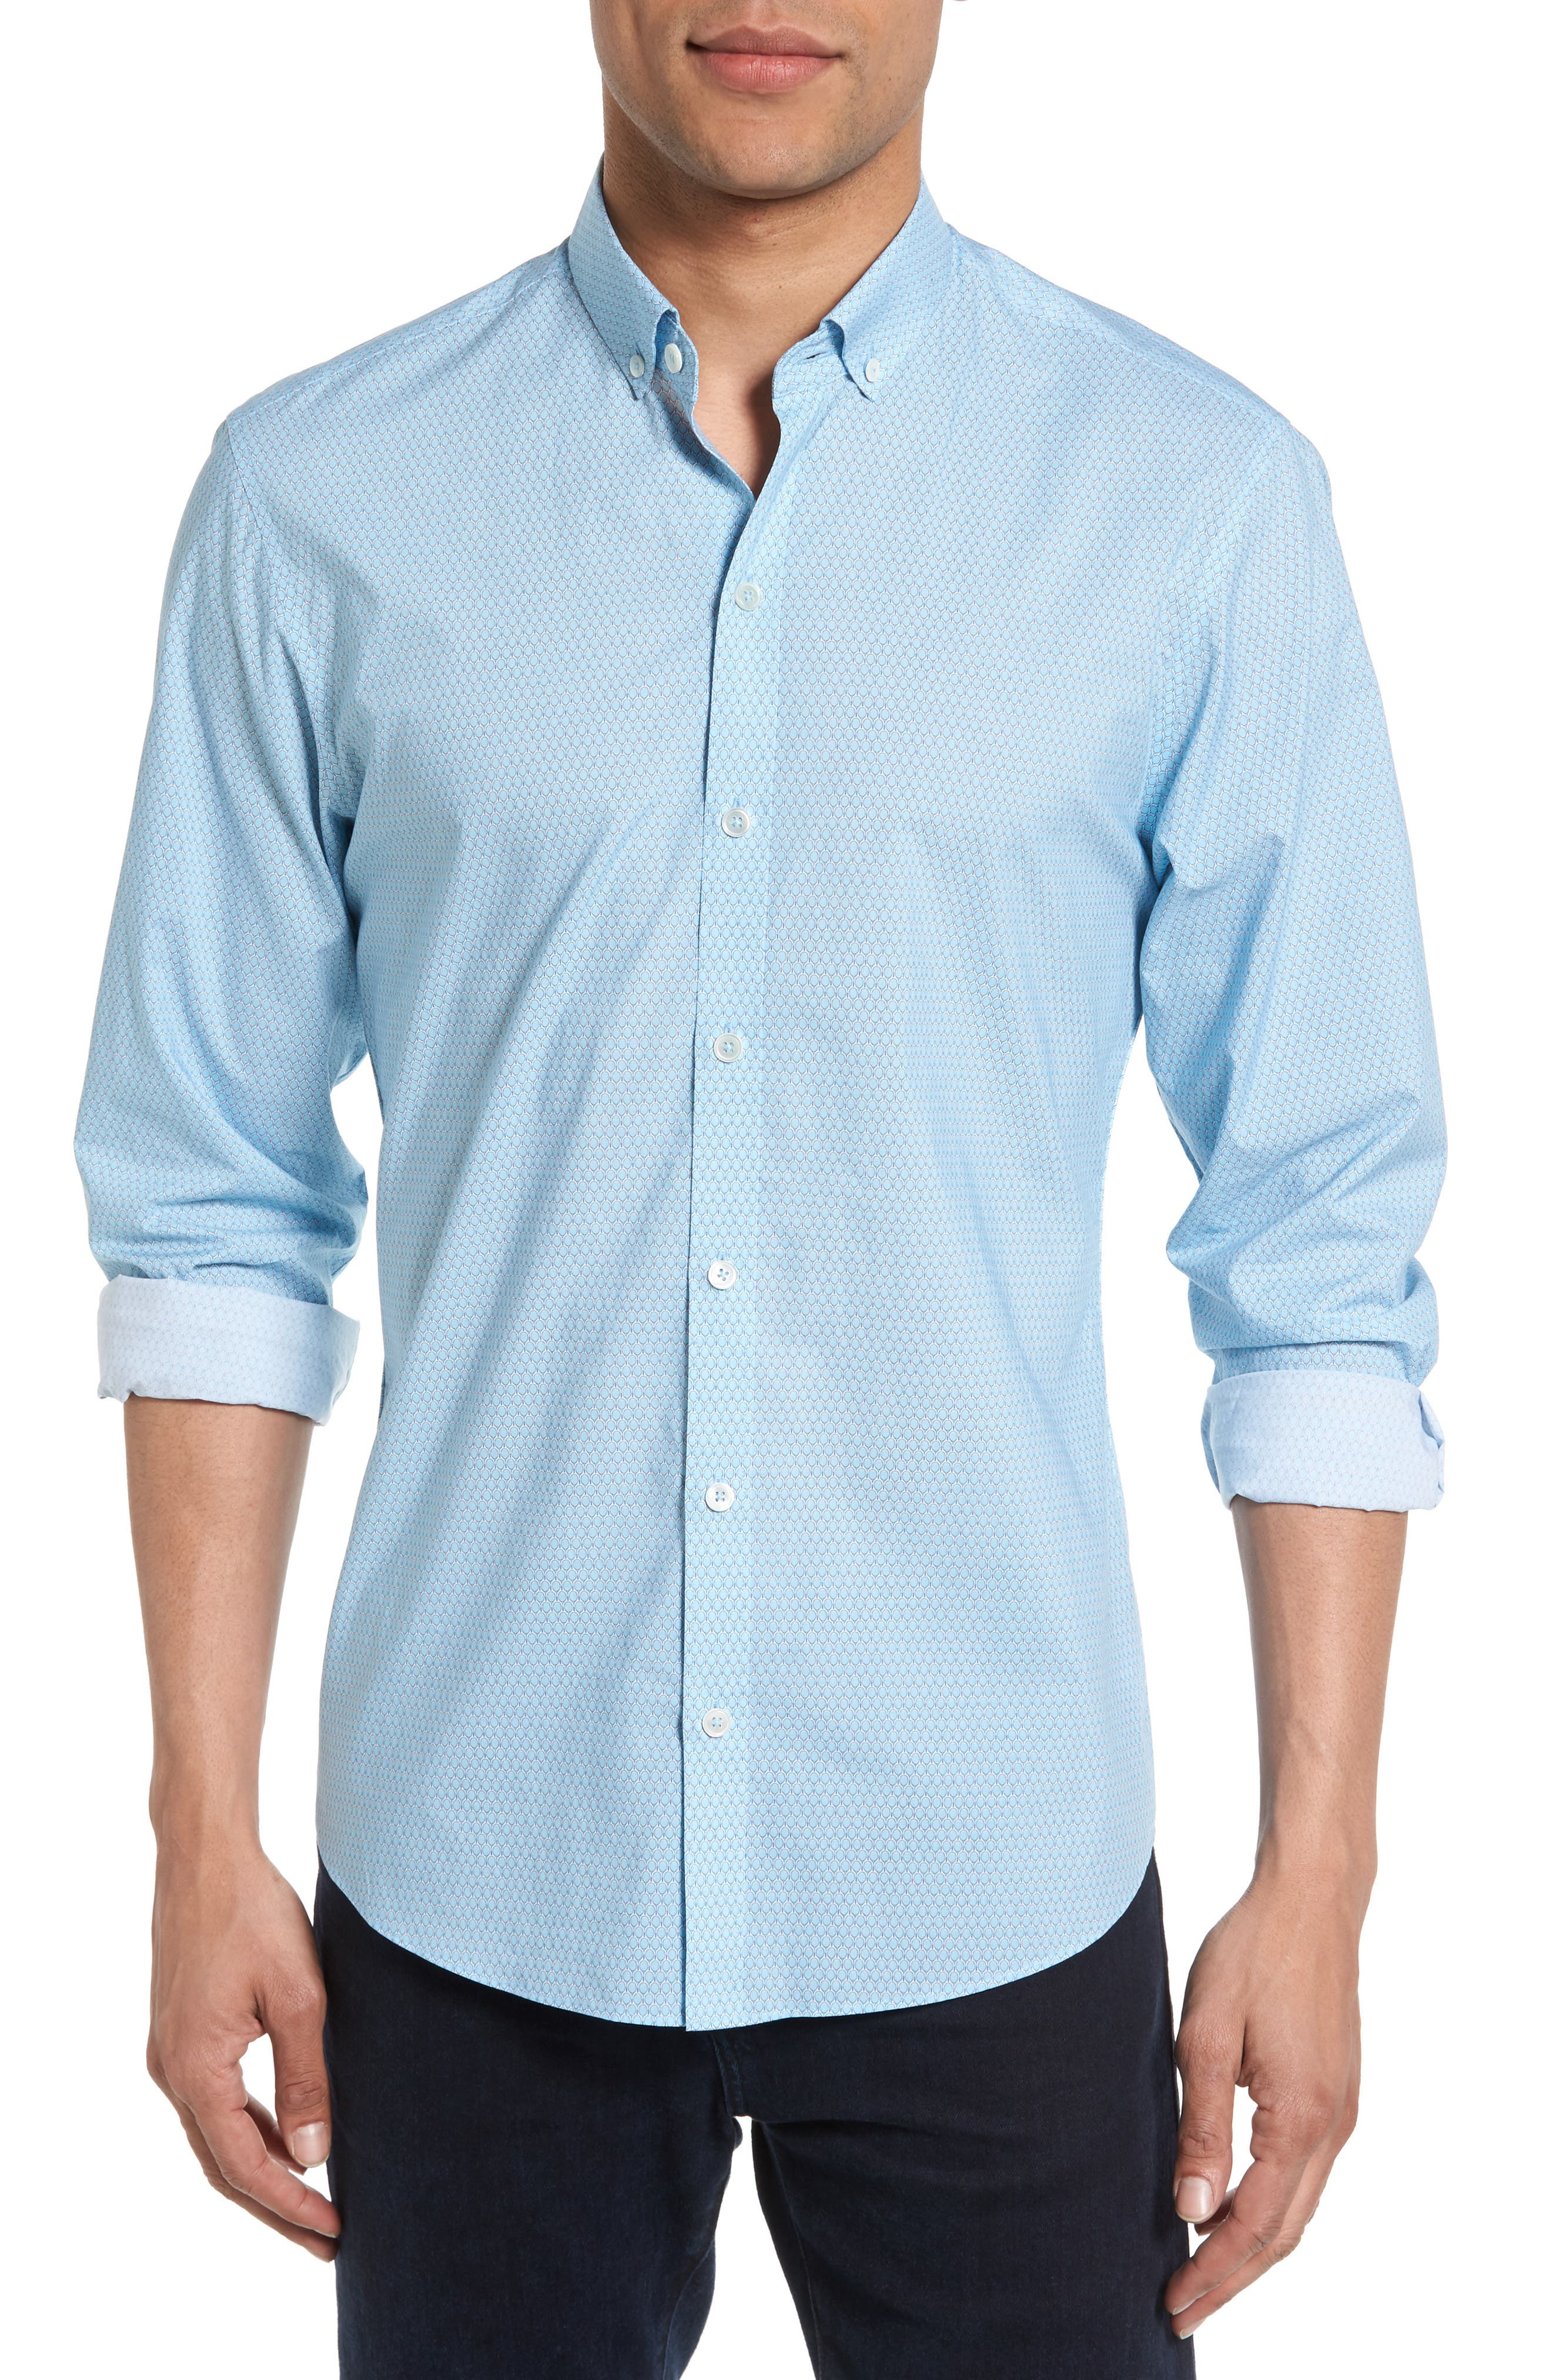 Dakotah Trim Fit Print Sport Shirt,                             Main thumbnail 1, color,                             LIGHT BLUE